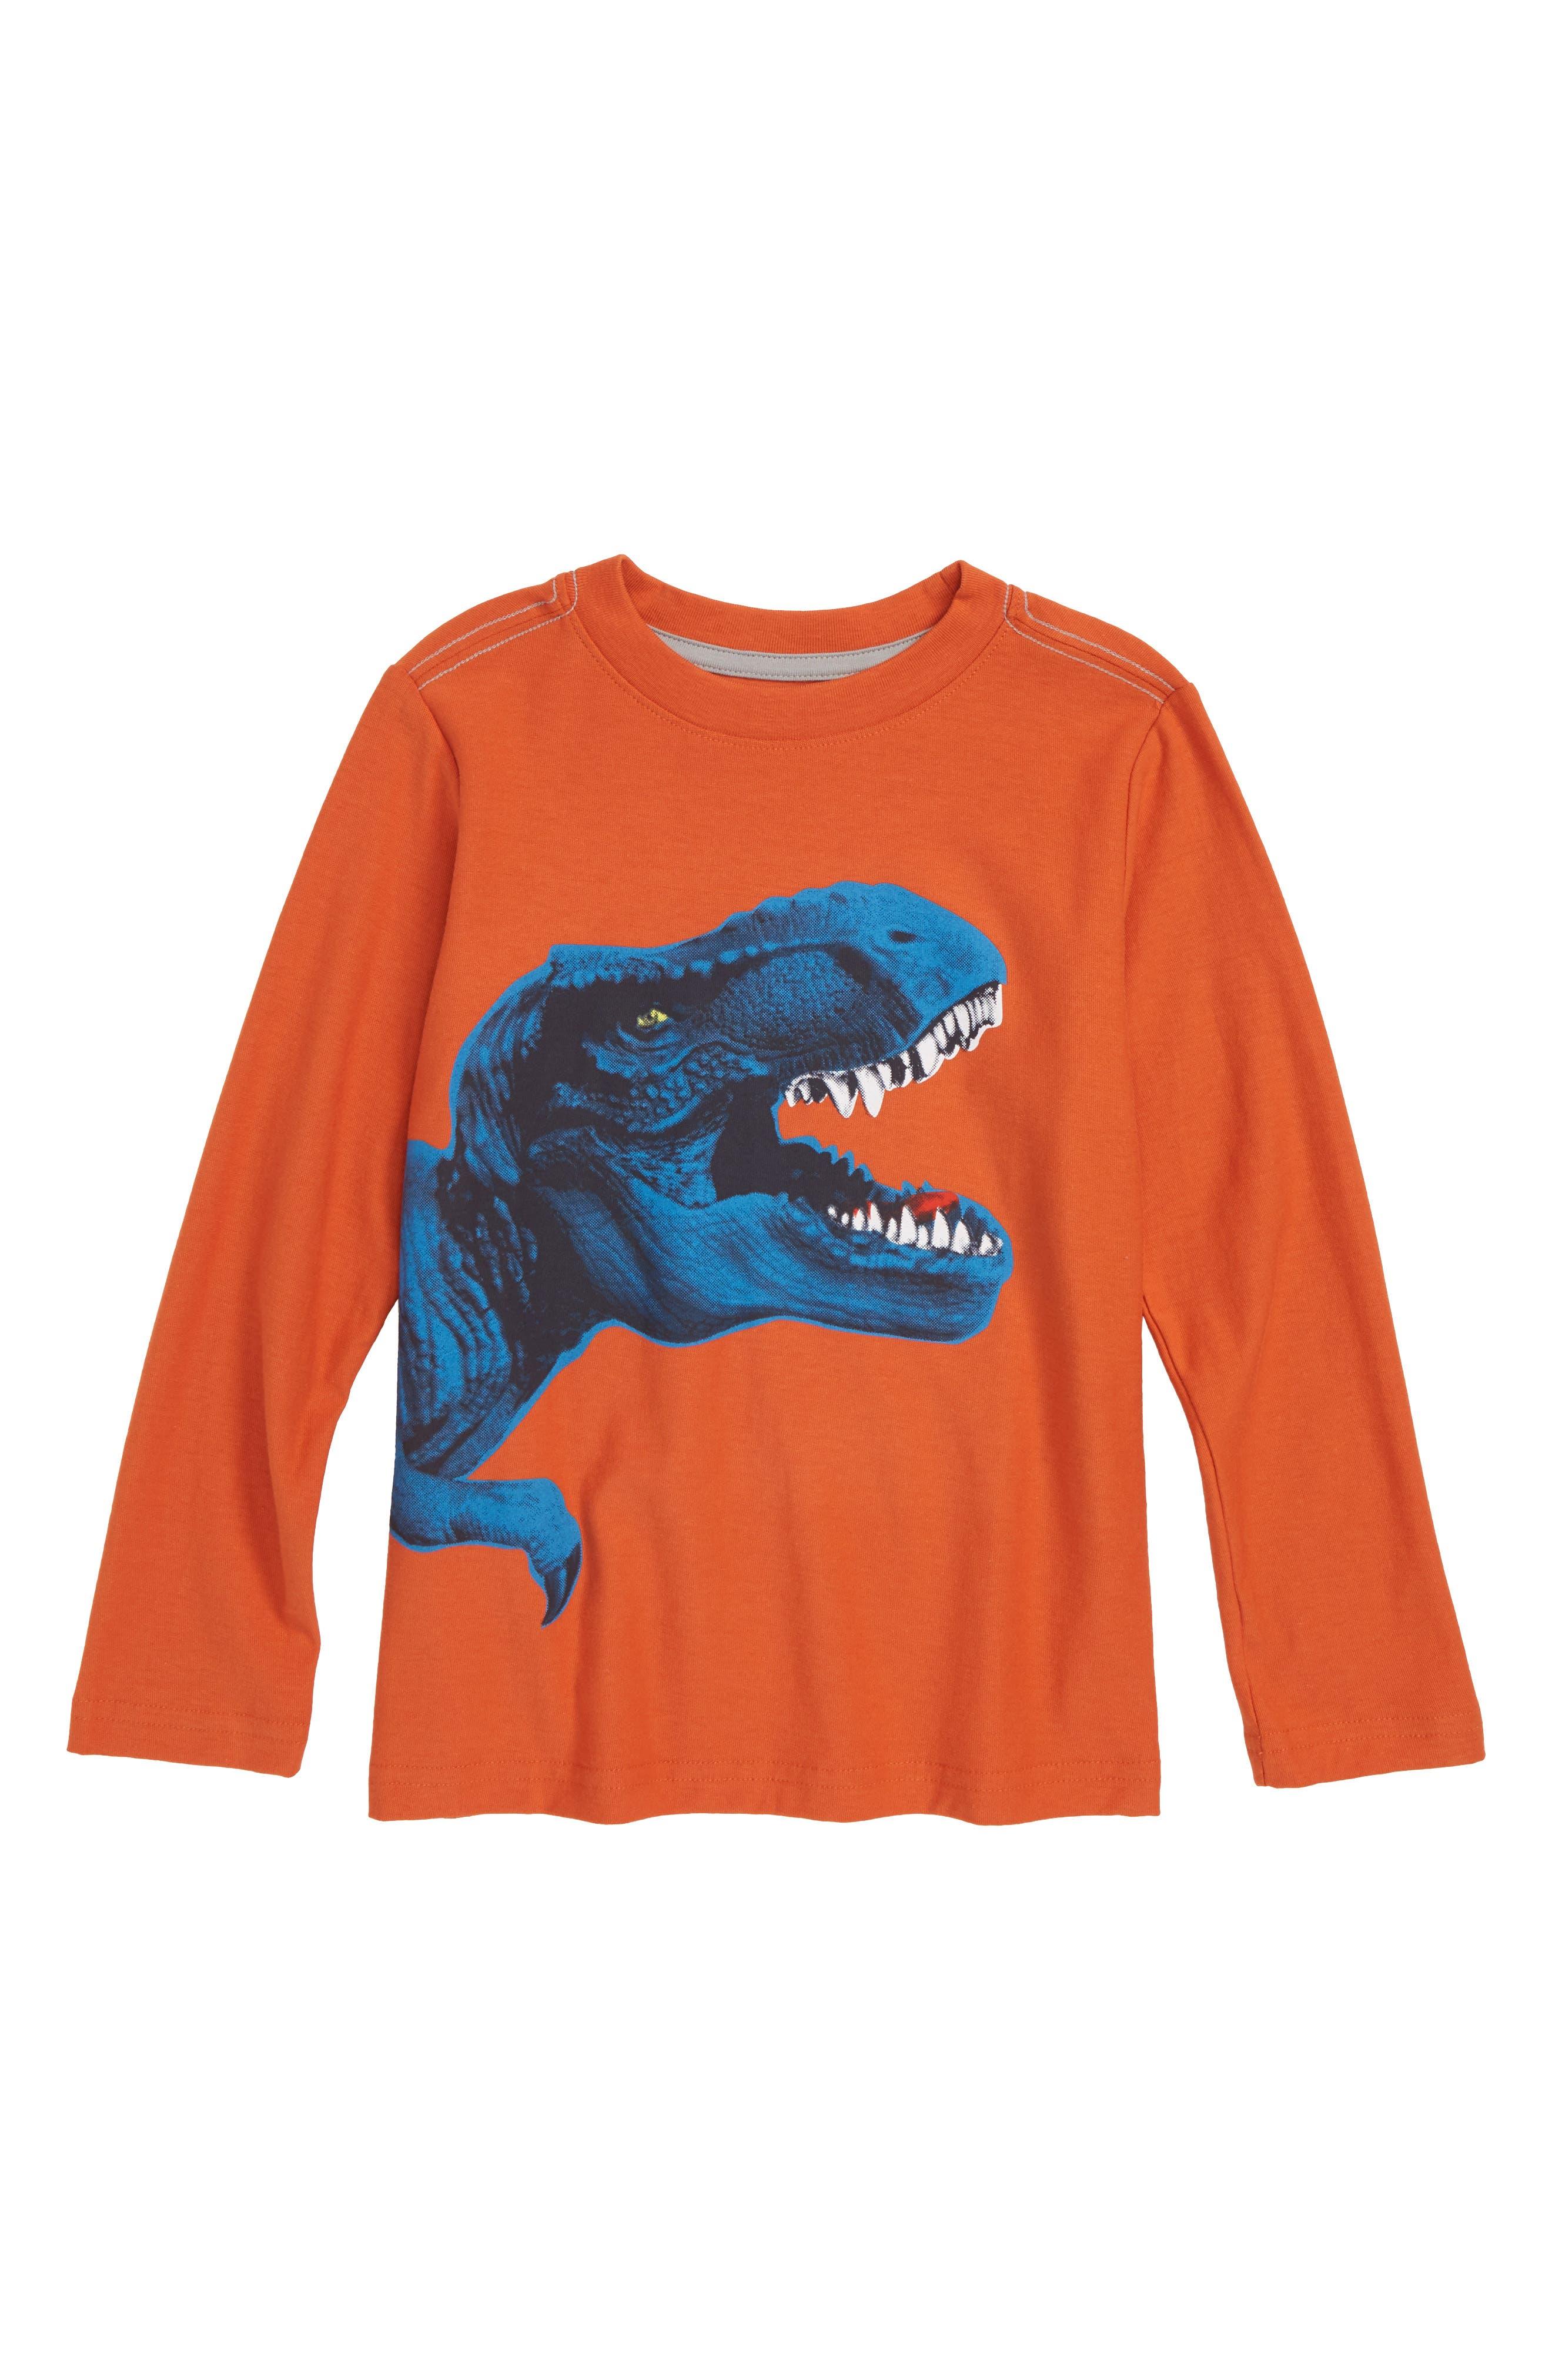 T-Rex T-Shirt,                         Main,                         color, TERRA